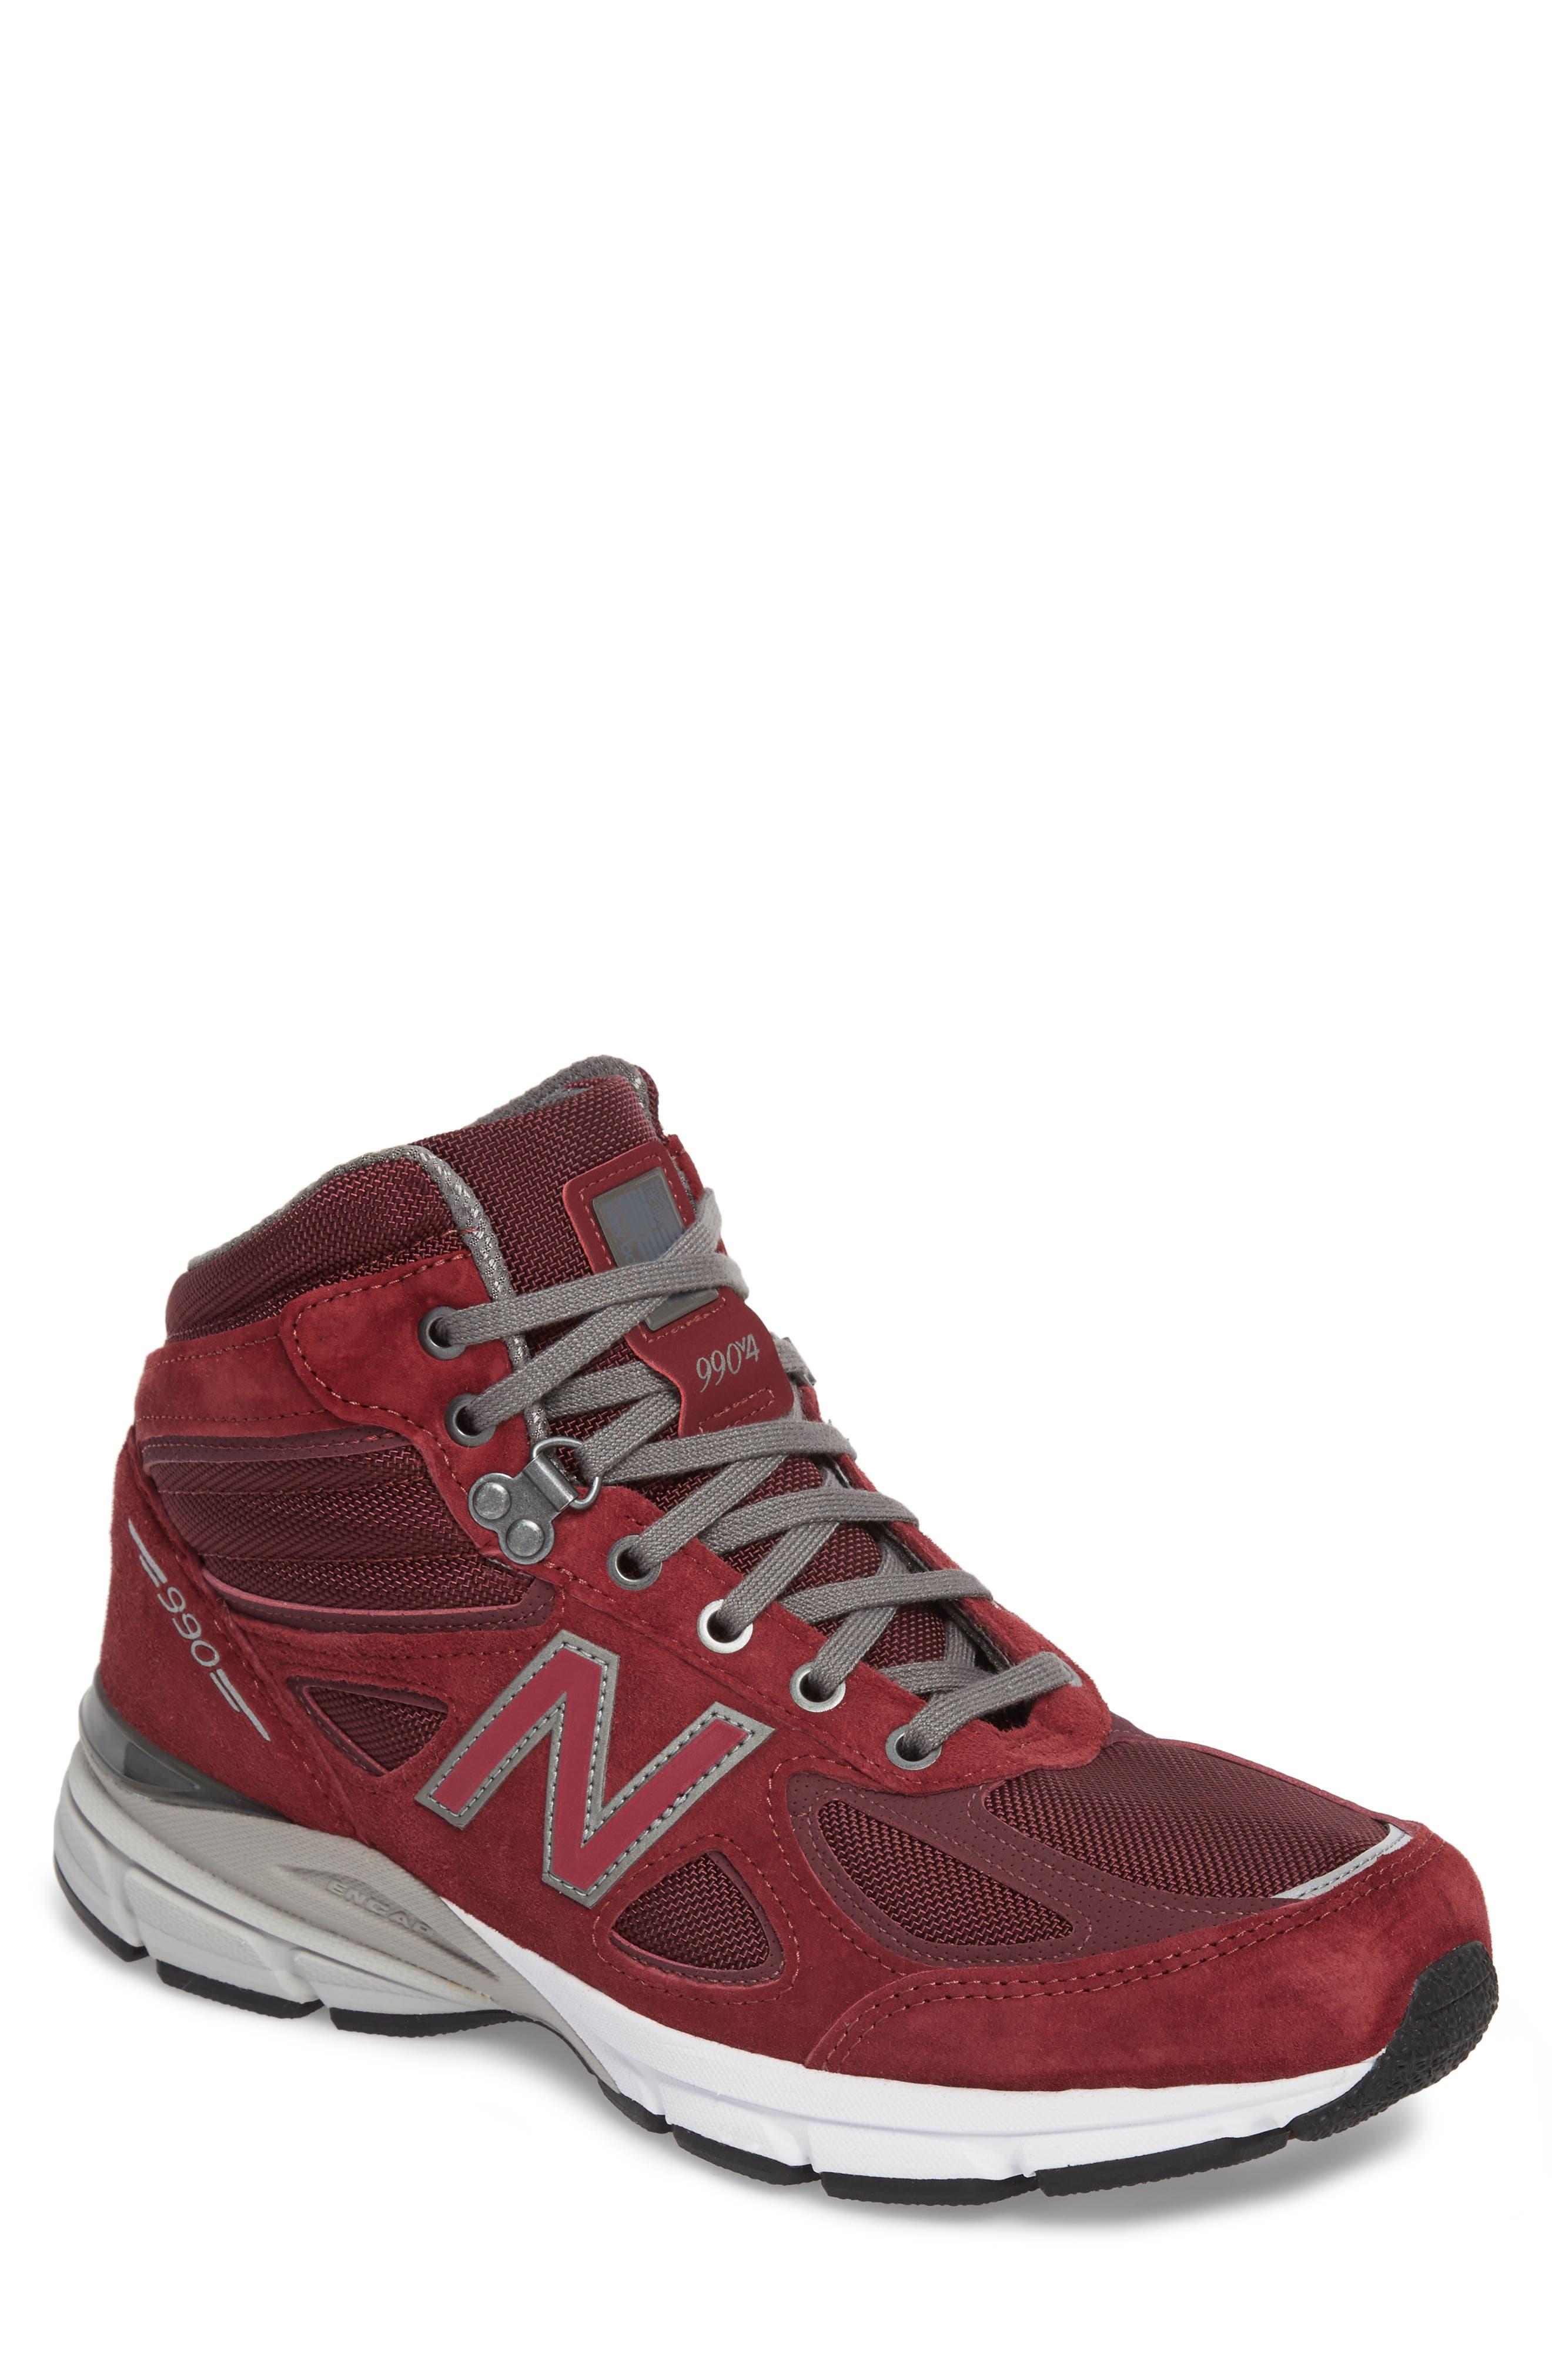 990v4 Water Resistant Sneaker Boot,                             Main thumbnail 1, color,                             932